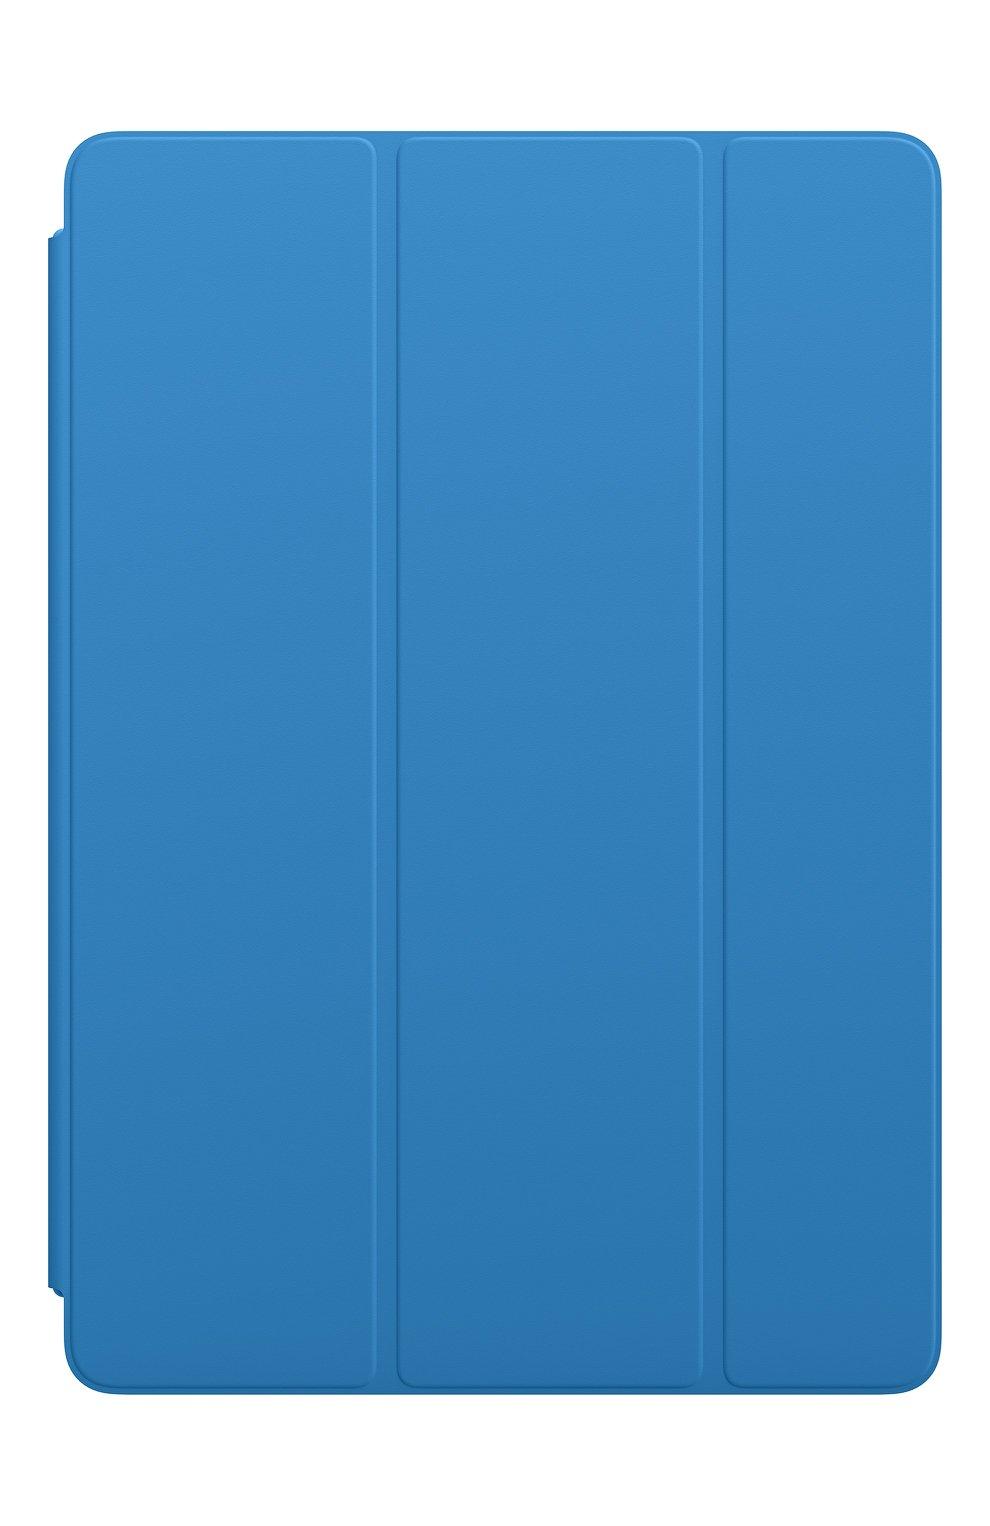 Мужской чехол smart cover для ipad (7th gen)/ipad air (3rd gen) APPLE  синего цвета, арт. MXTF2ZM/A   Фото 1